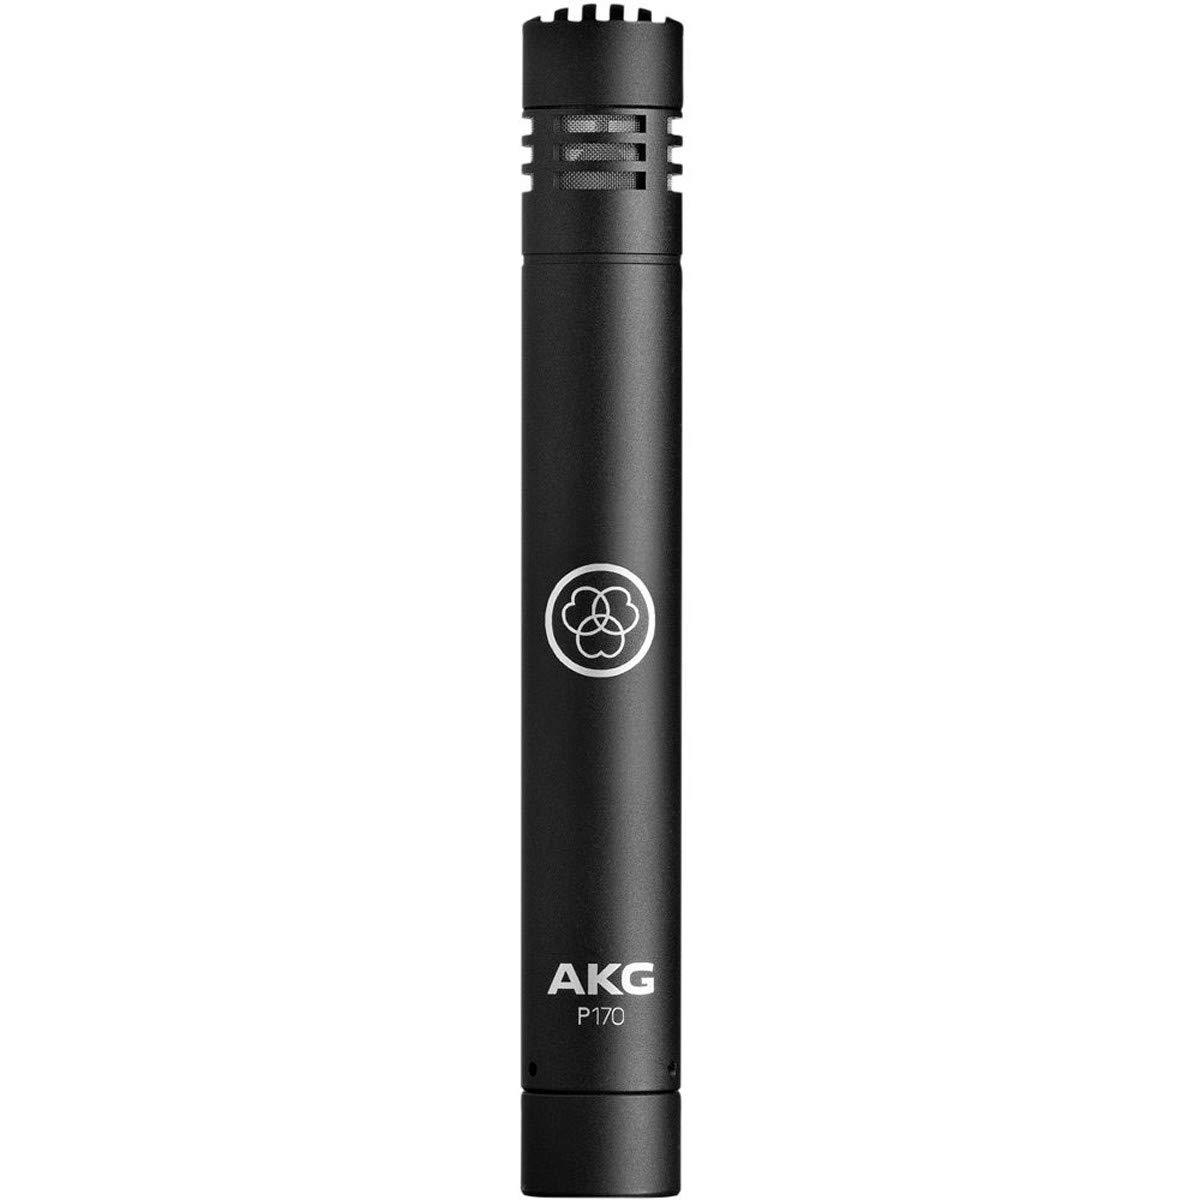 AKG Perception 170 Professional Instrumental Microphone